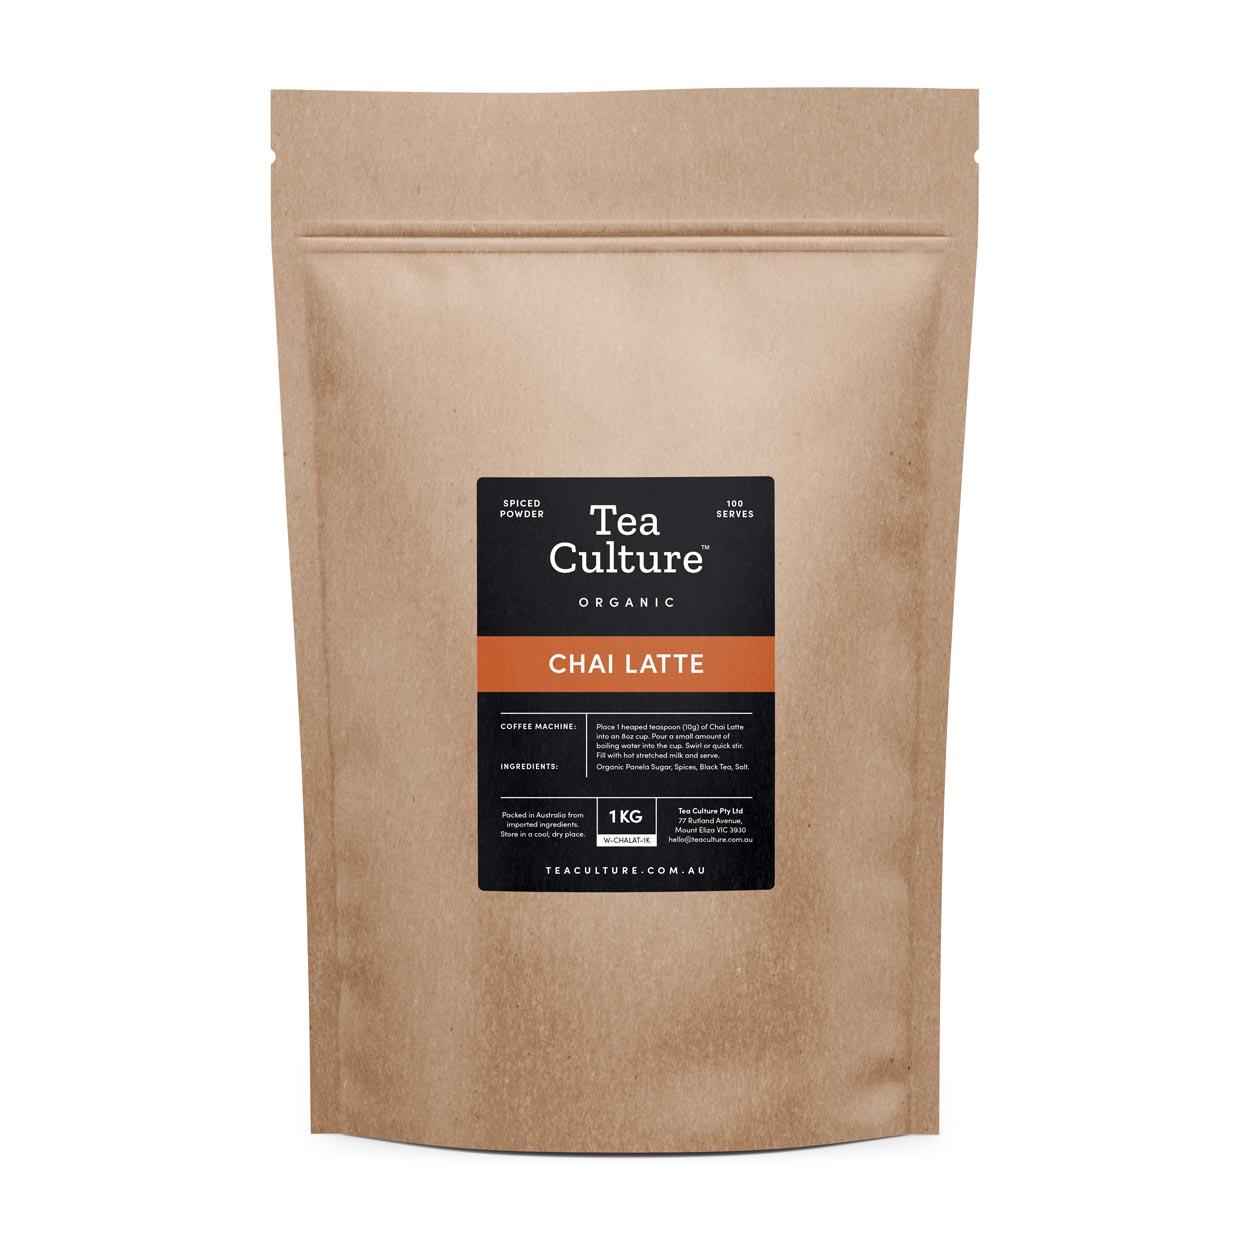 Tea Culture™ Powder Chai Latte 1KG